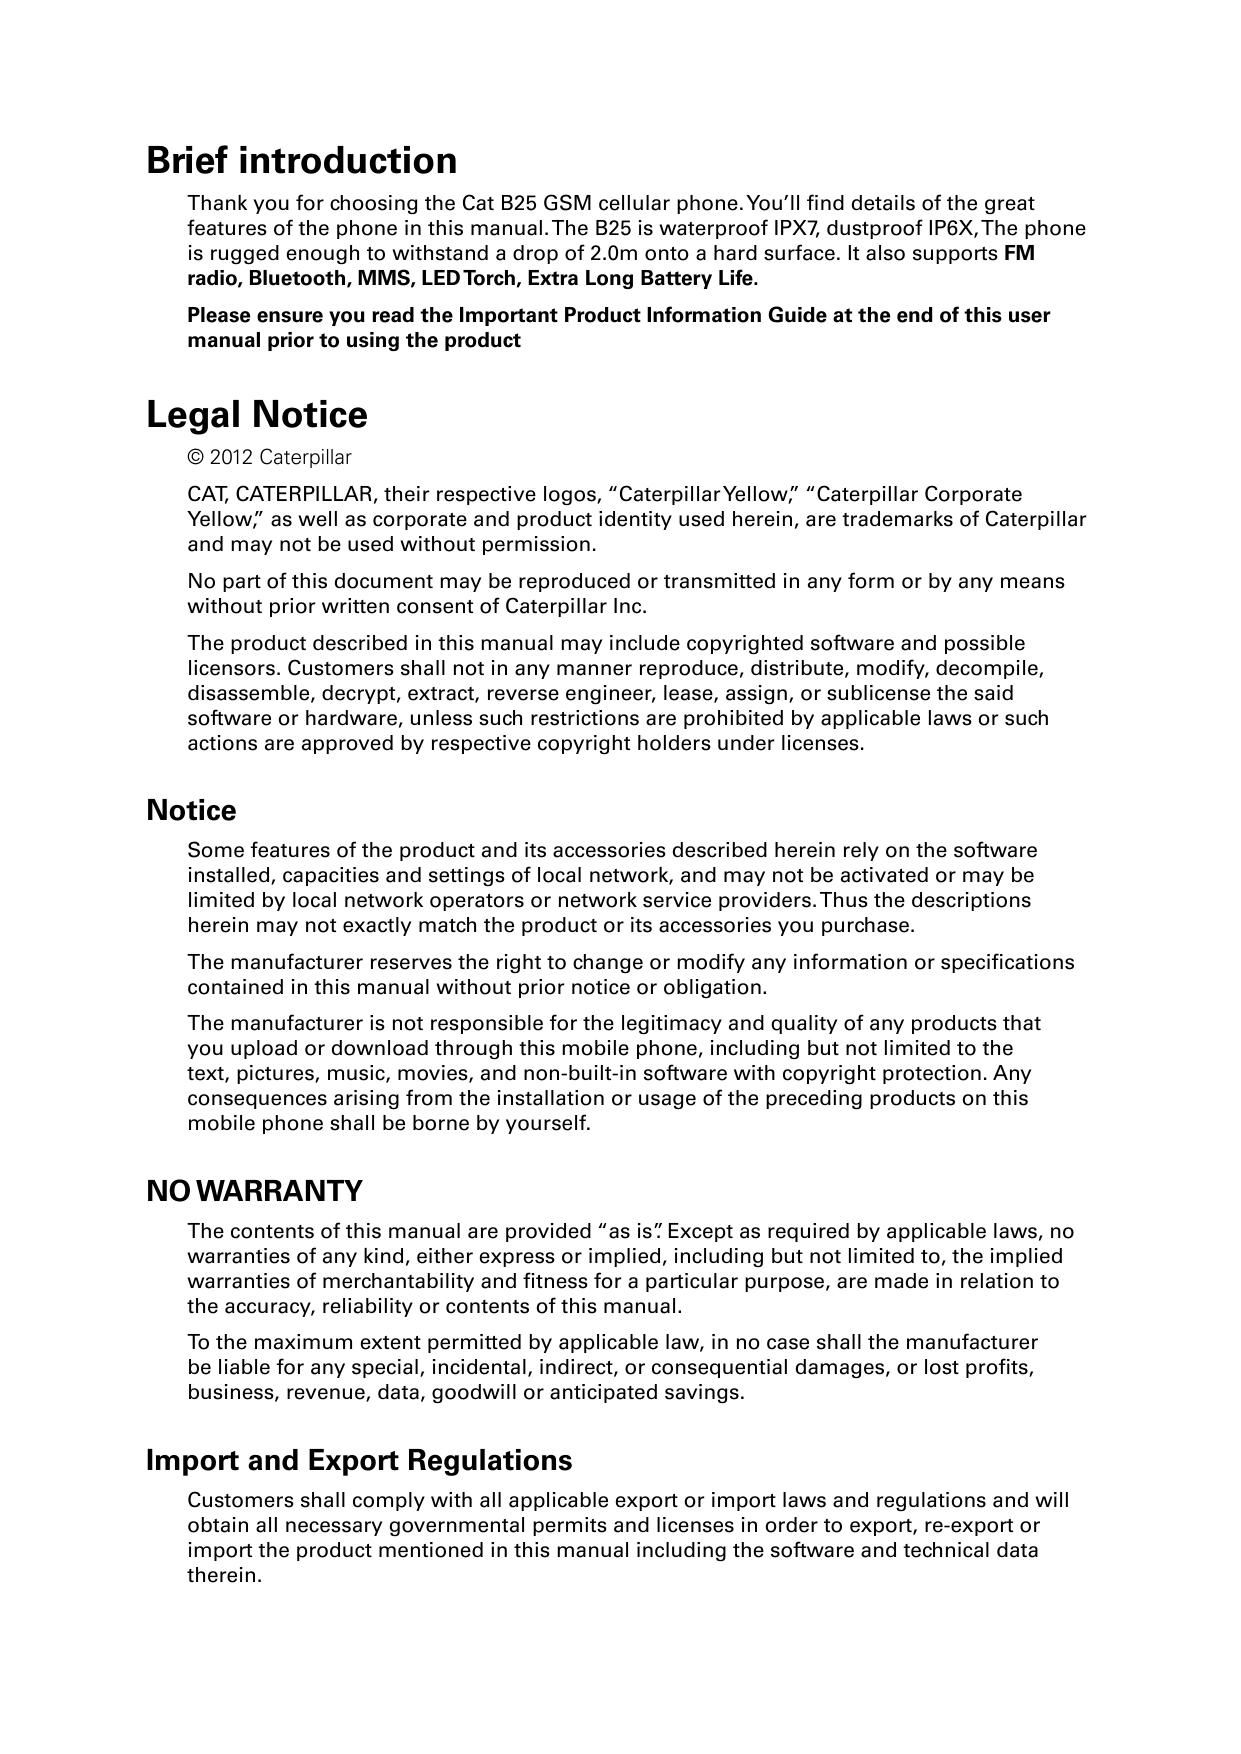 manual caterpillar cat b25 proprietary device guides rh helpforsmartphone com User Manual Guide Standard Operating Manual